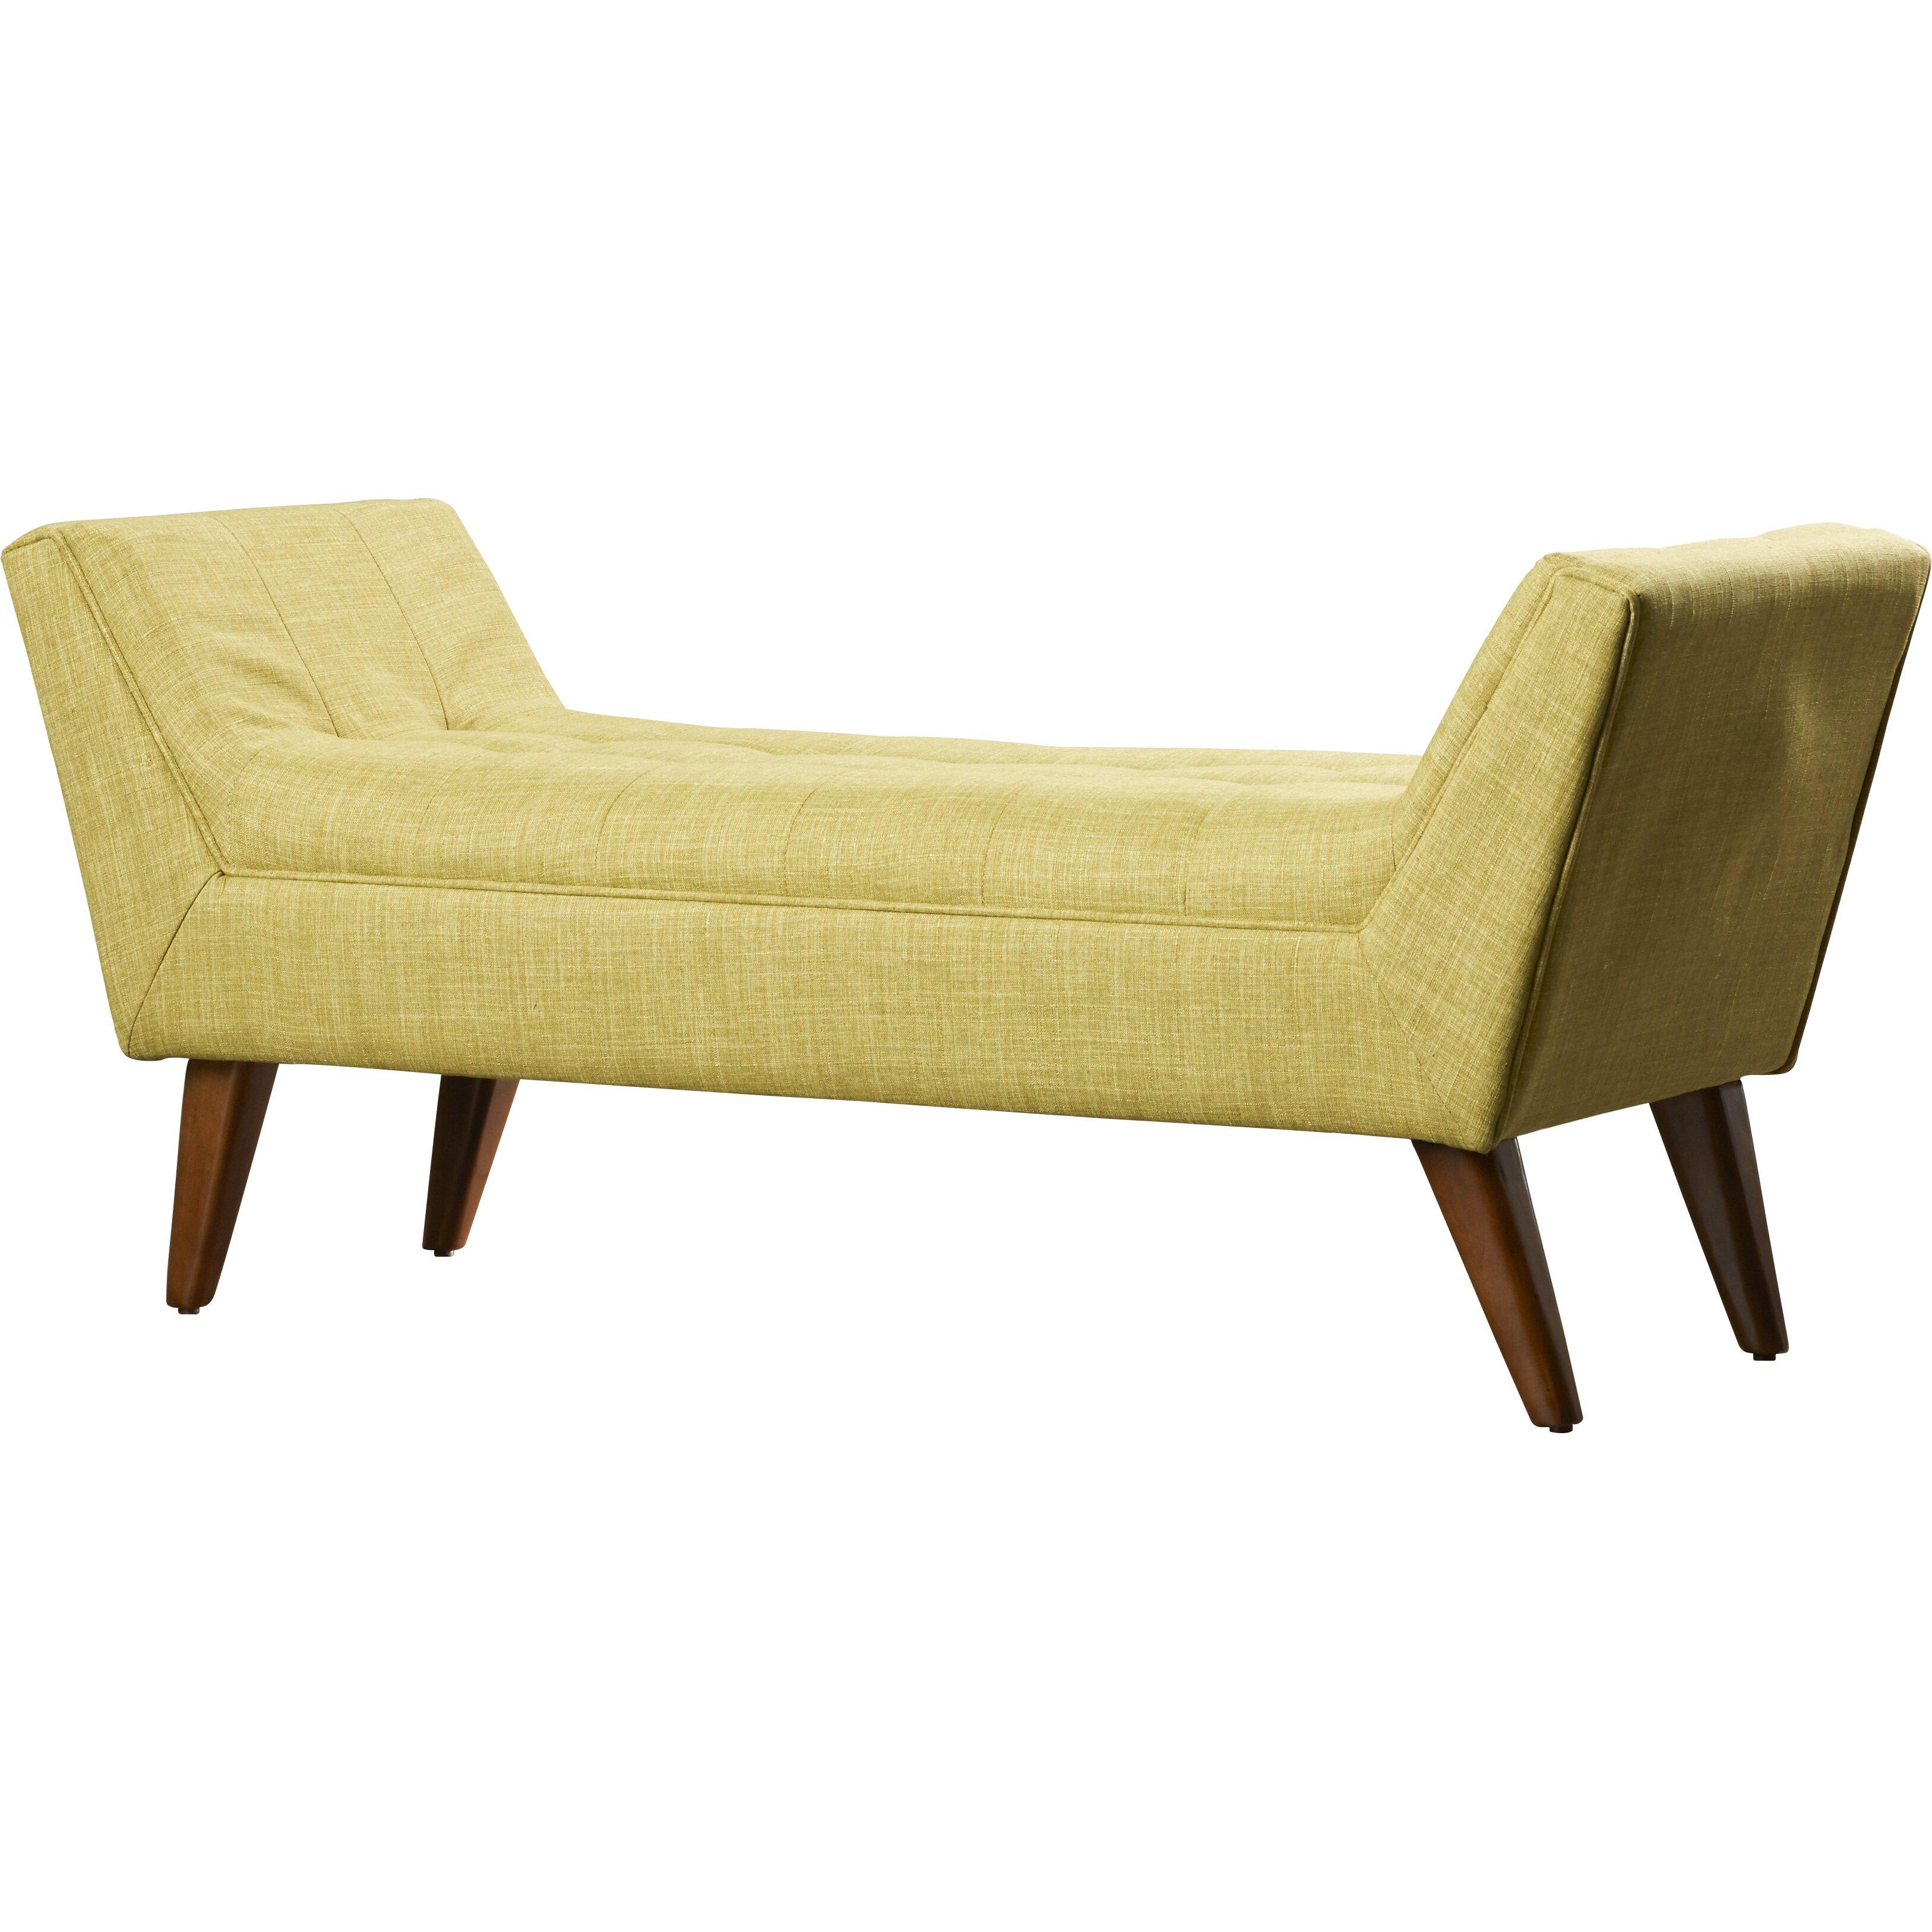 Langley Street Serena Upholstered Bedroom Bench & Reviews